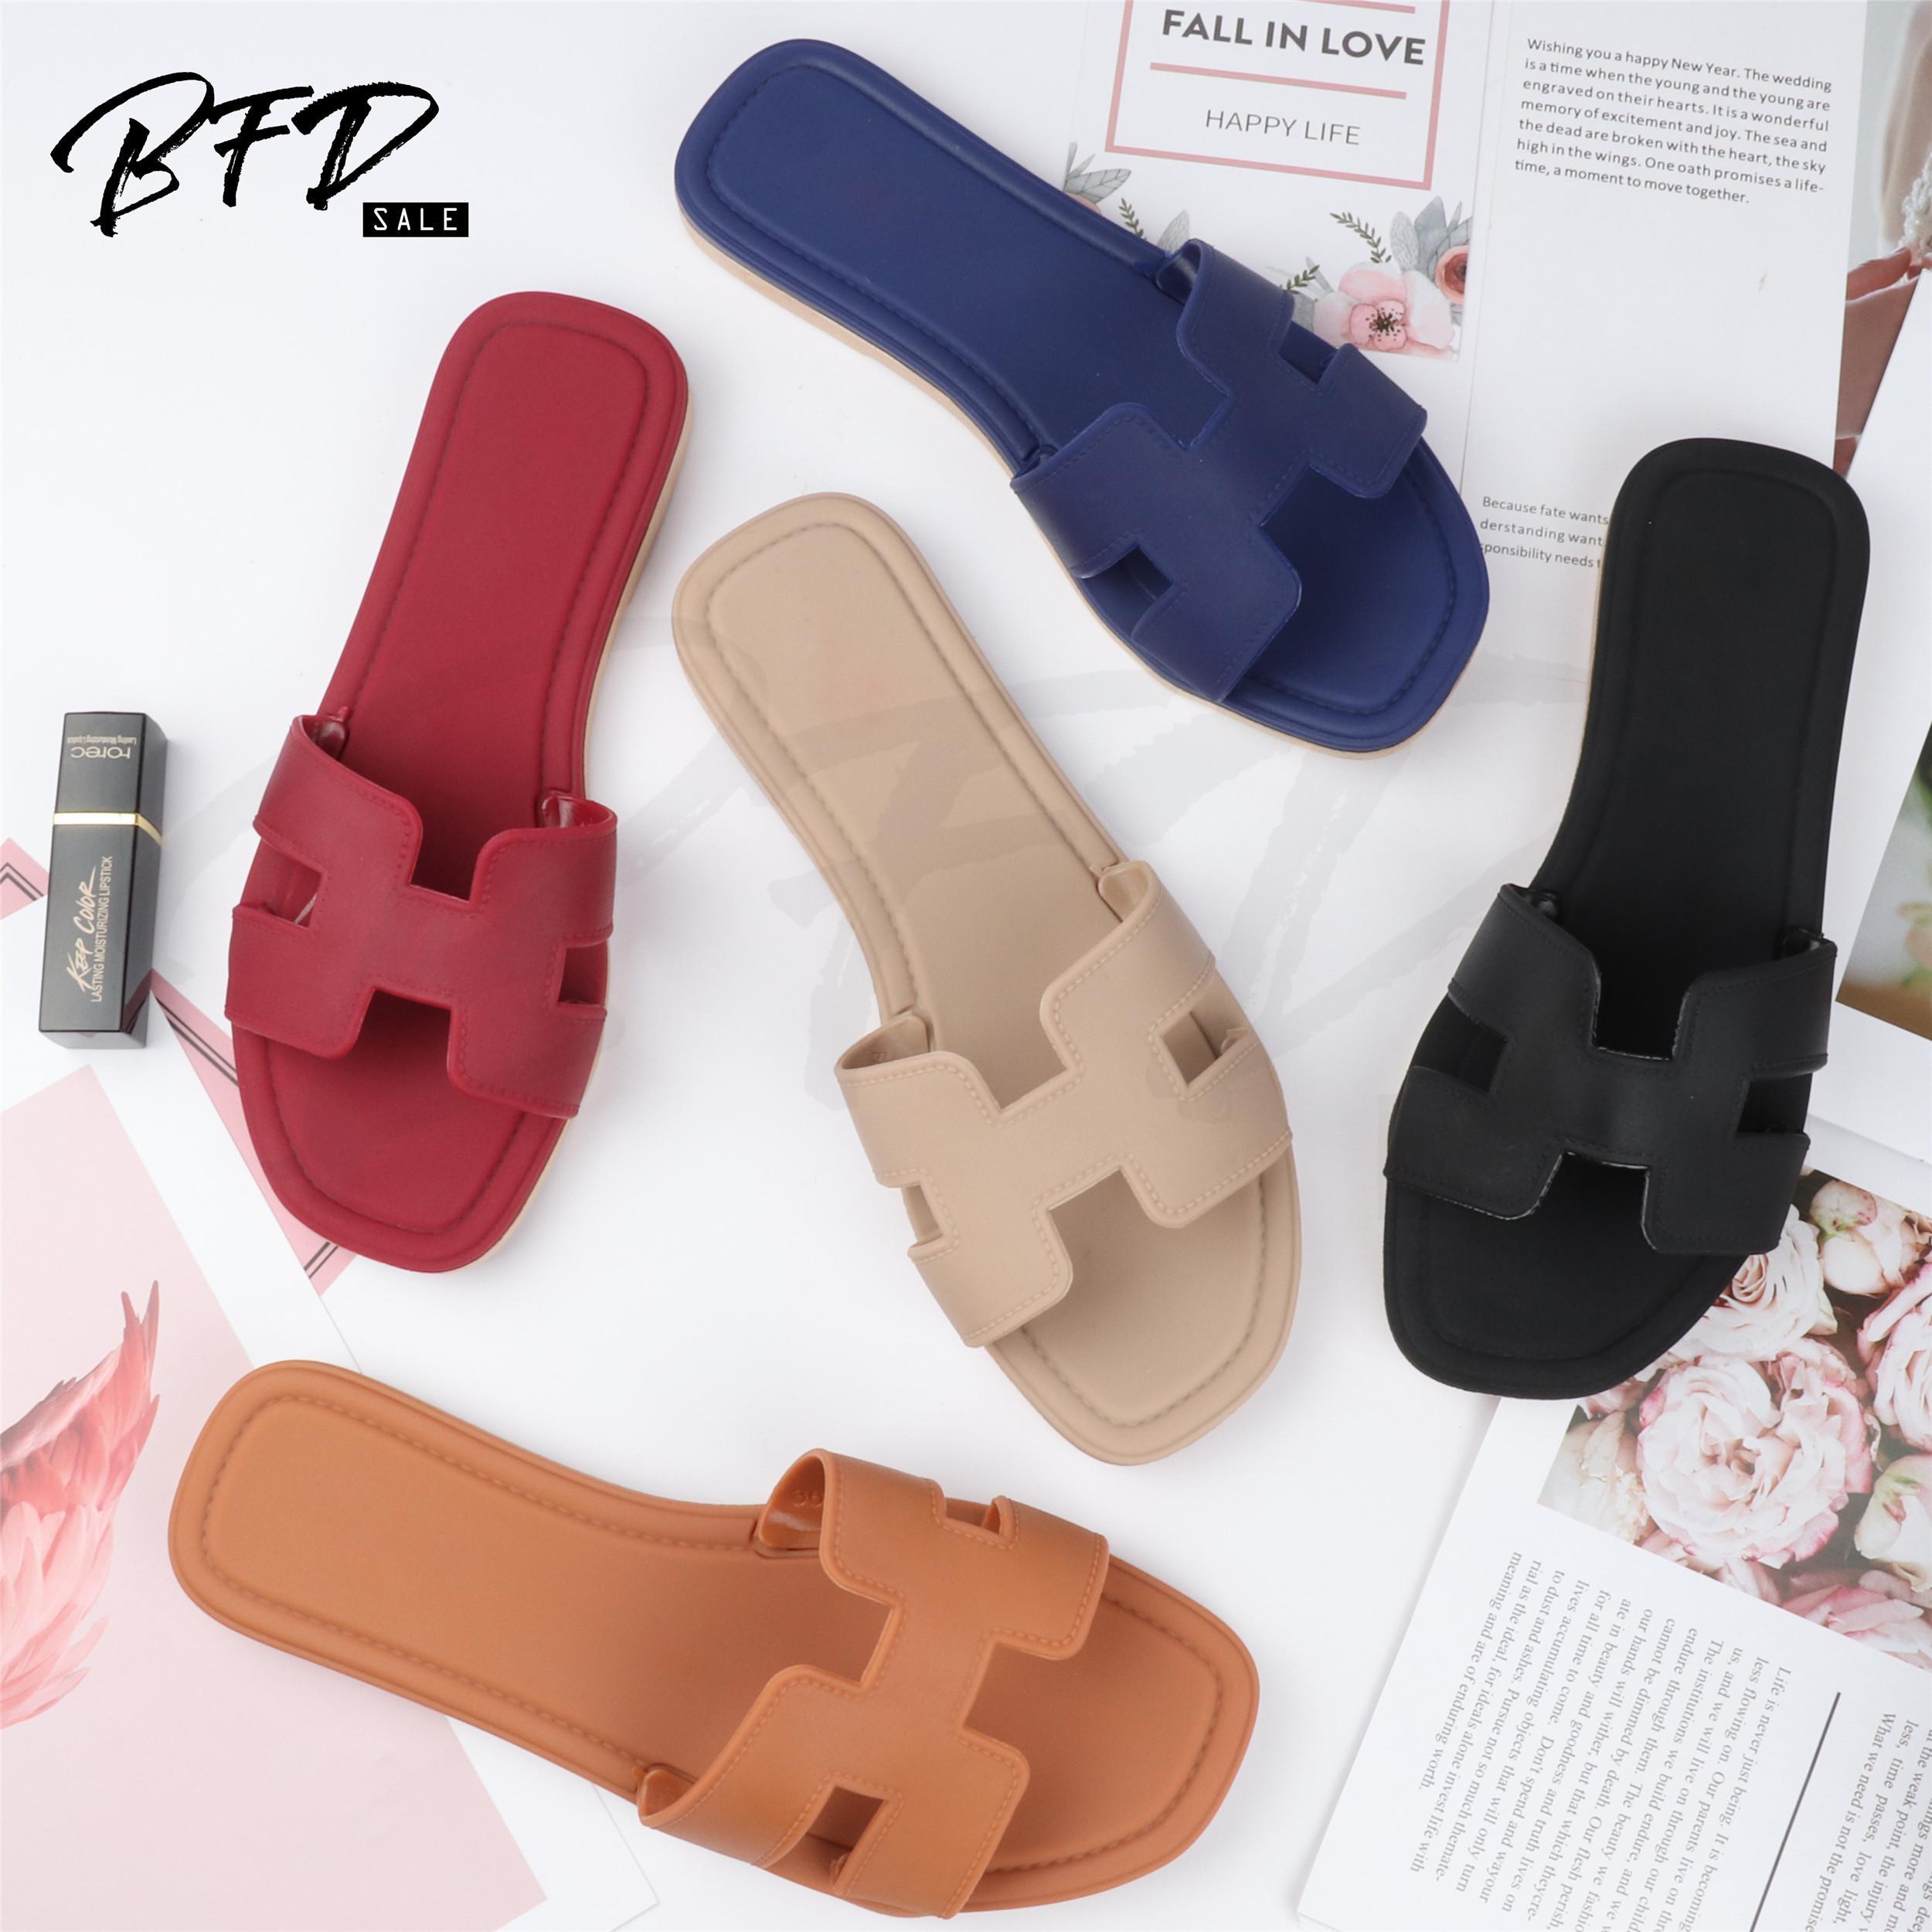 Big Sale Korean Style Ladies Flat Sandals Slip on Sandals Slippers for Women L8915